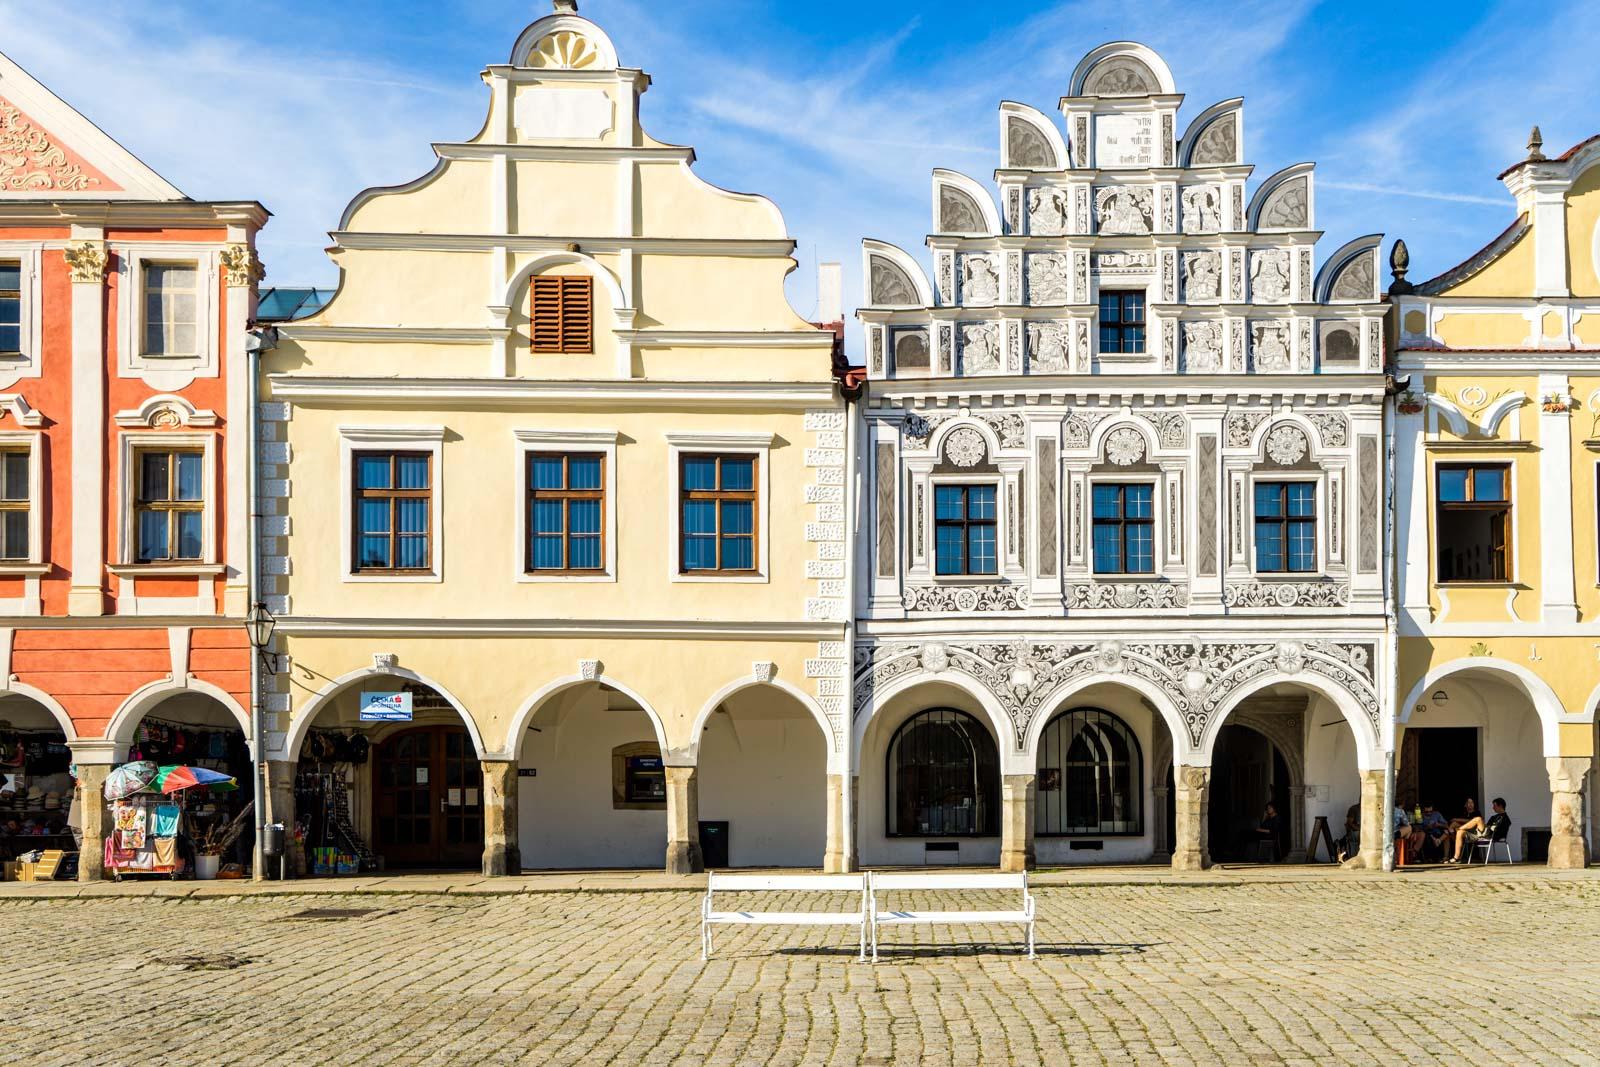 Czech Republic: a selection of sites